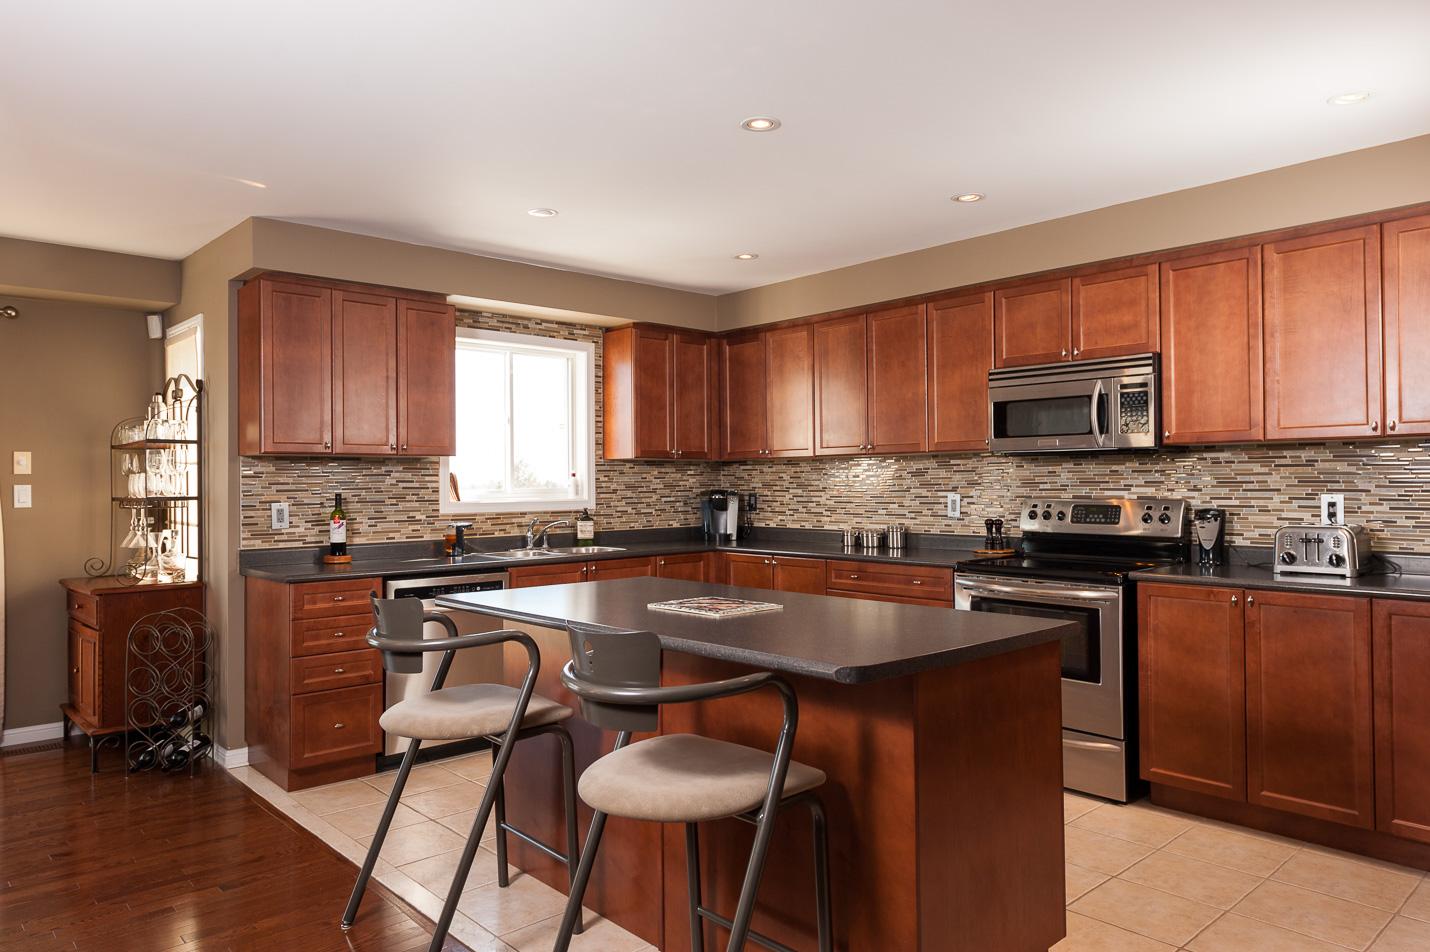 kitchen island peterborough interiors photograph interior photographer real estate photographer